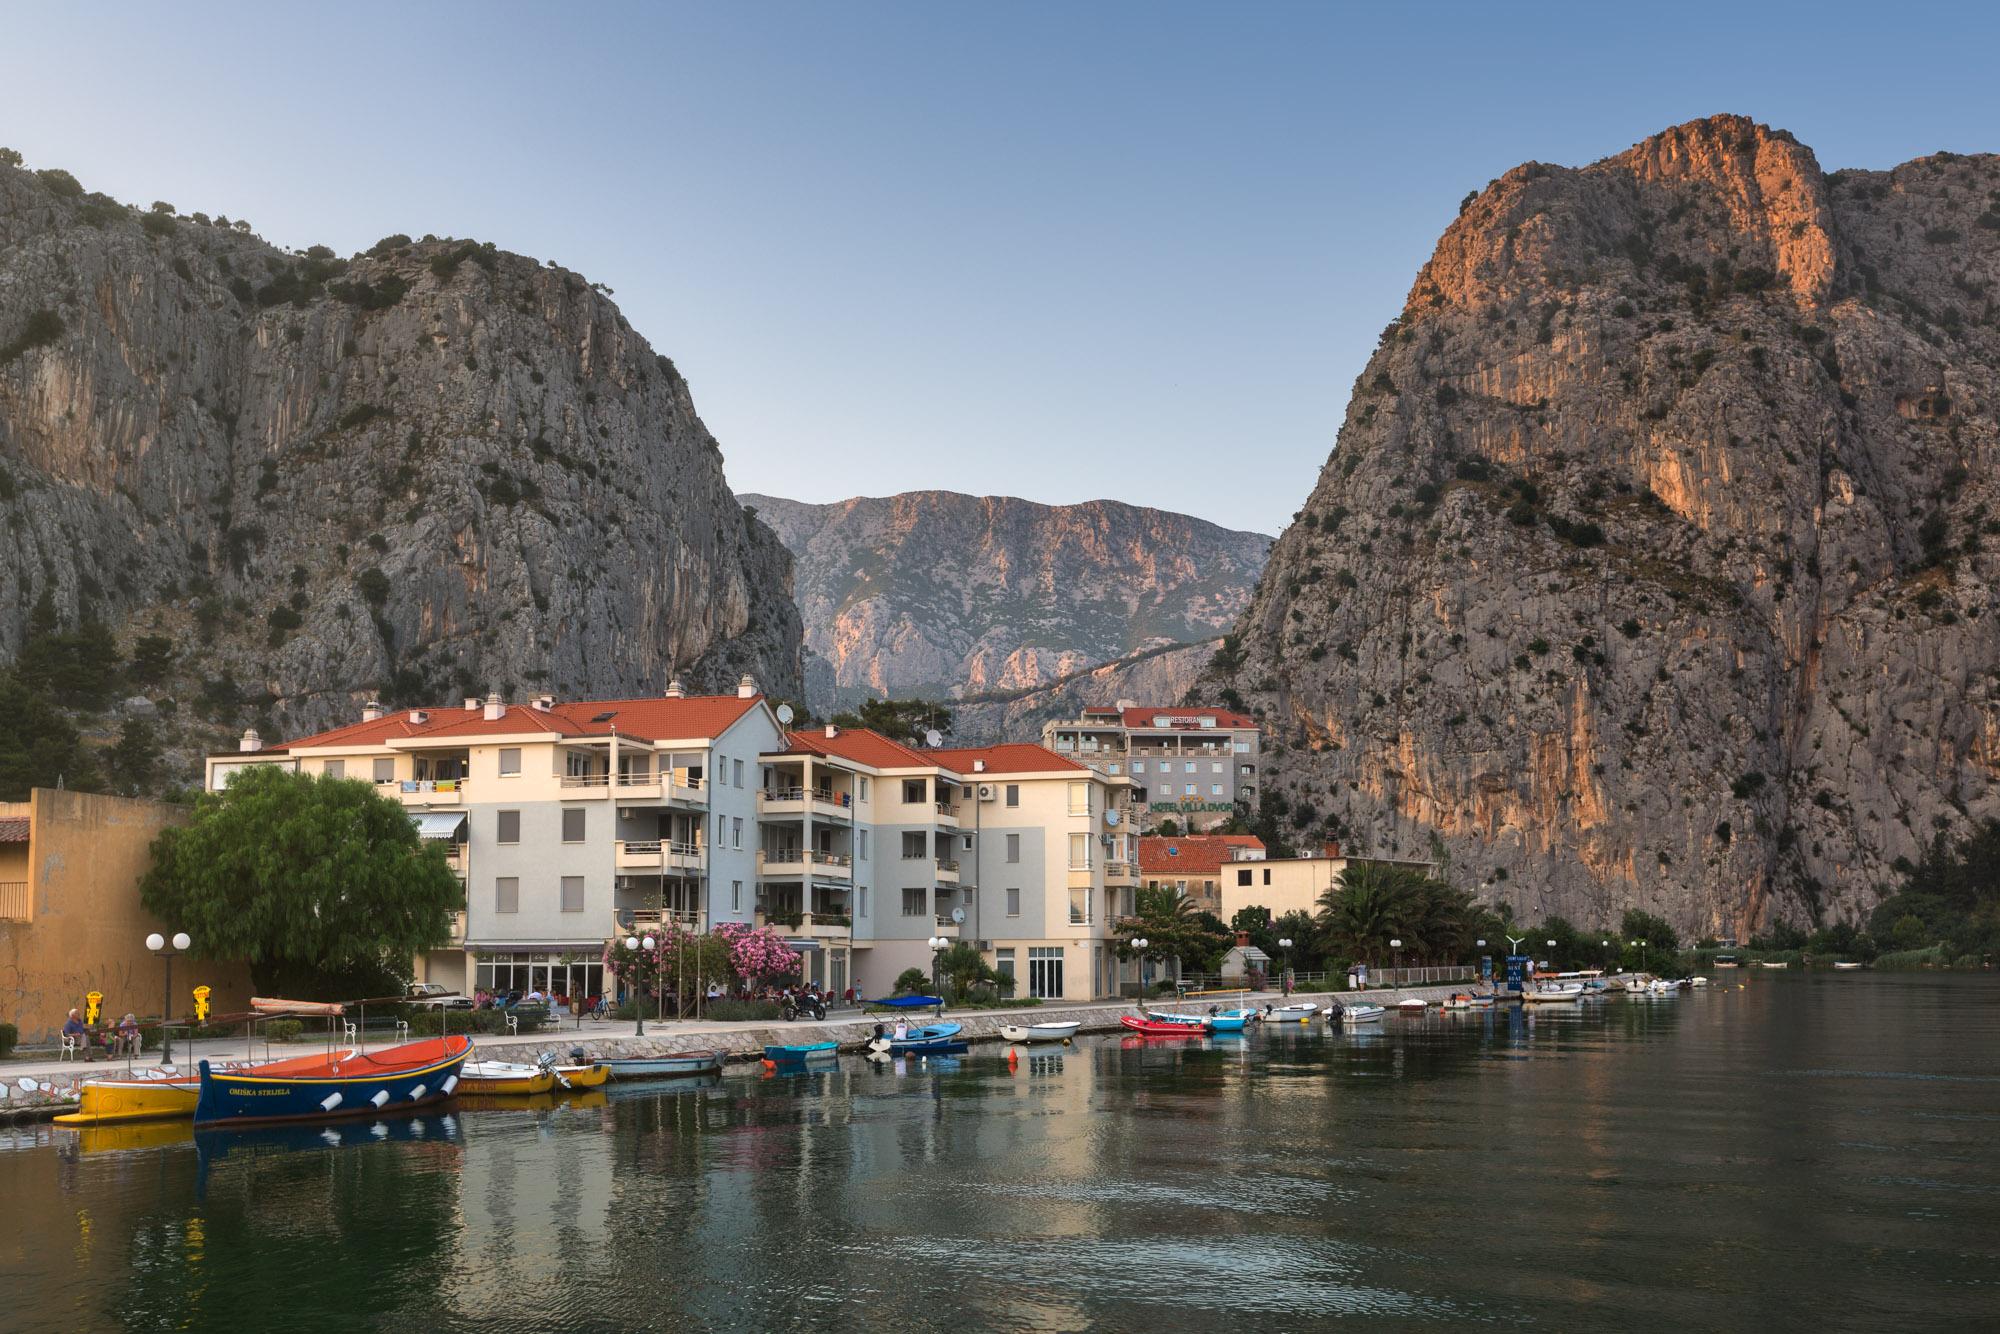 City of Omis and Cetina River, Croatia